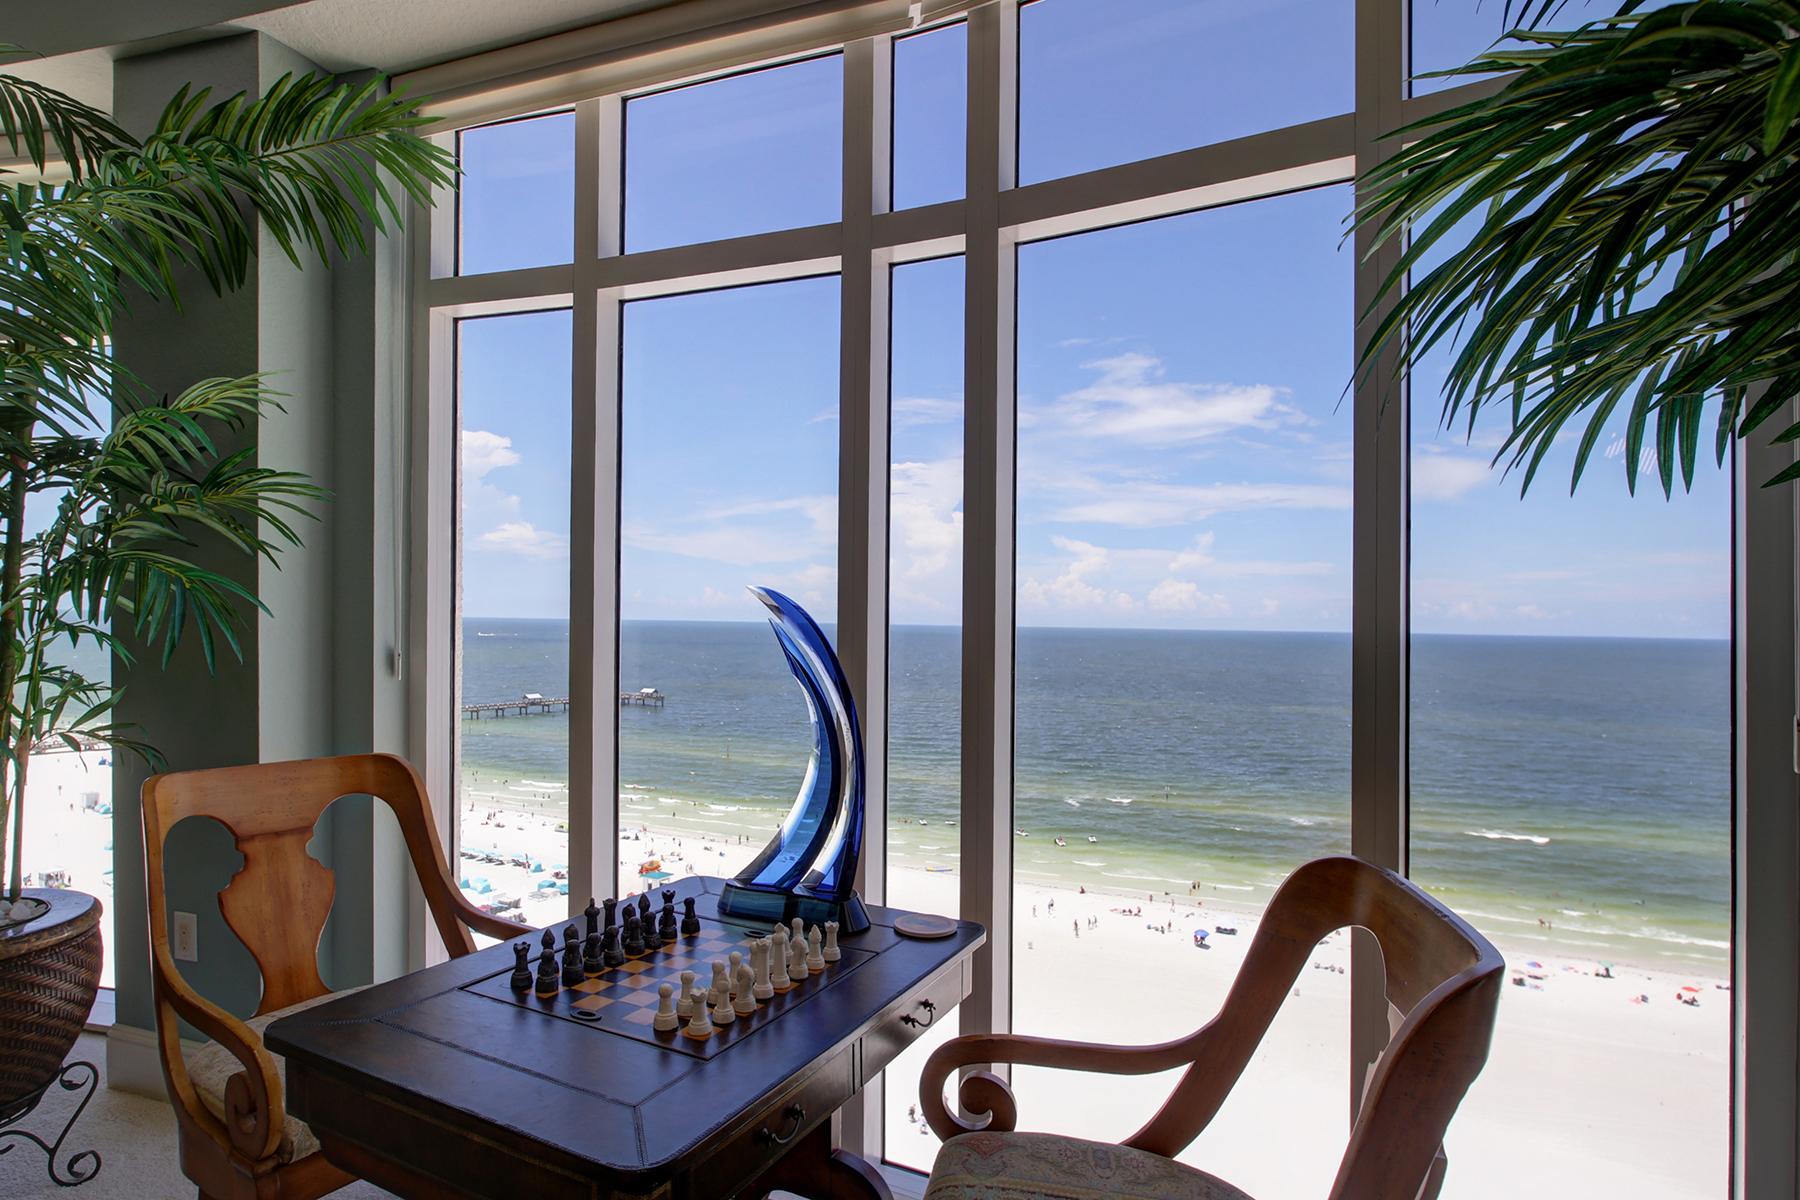 Condominium for Sale at MANDALAY BEACH CLUB 10 Papaya St 1501 Clearwater Beach, Florida 33767 United States